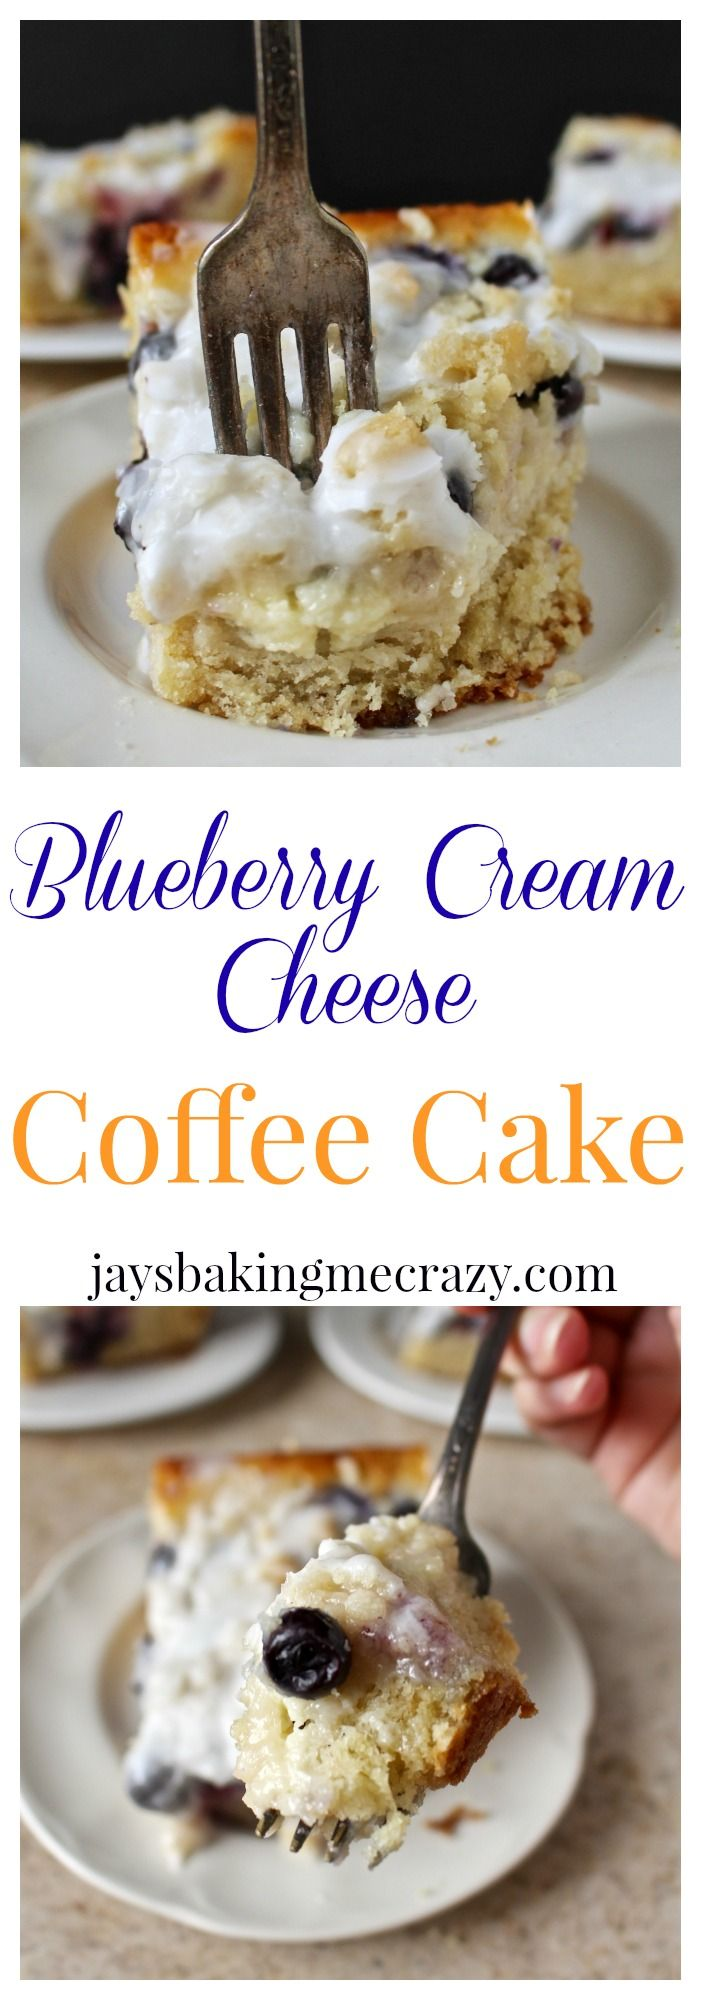 Blueberry Cream Cheese Coffee Cake Recipe Cakes, Cream